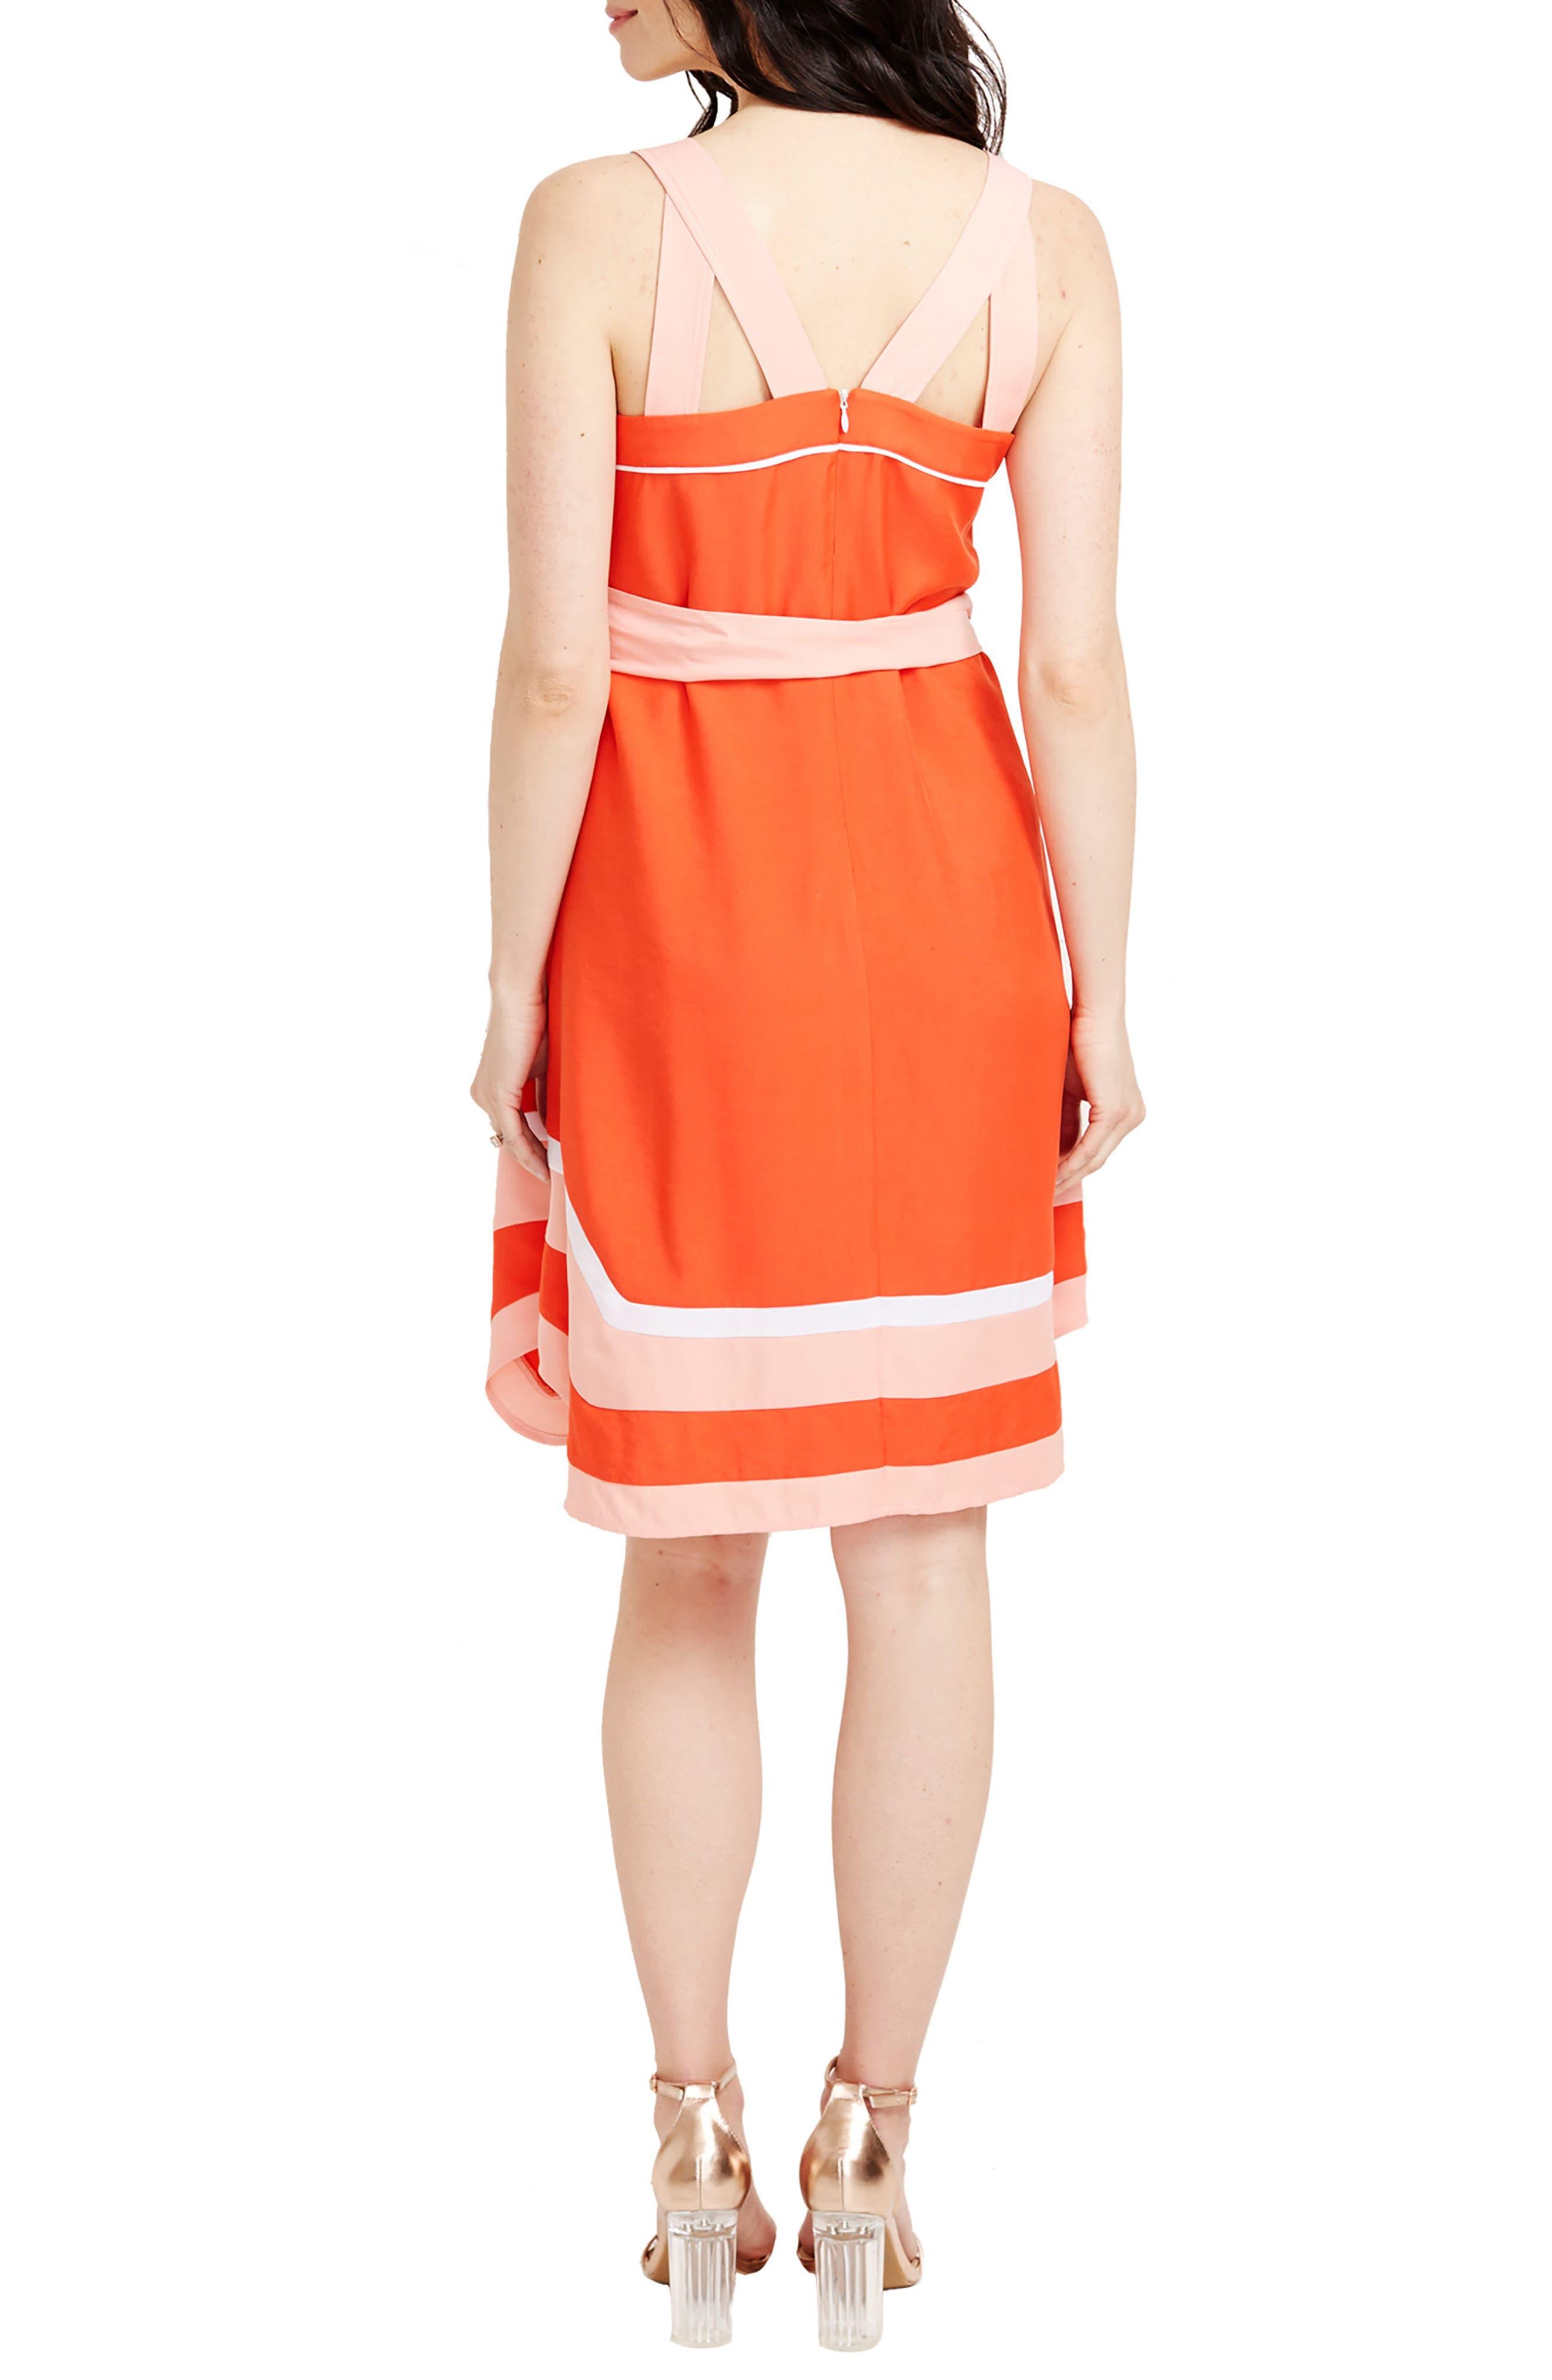 ROSIE POPE,                             Delfina Maternity Dress,                             Alternate thumbnail 2, color,                             820